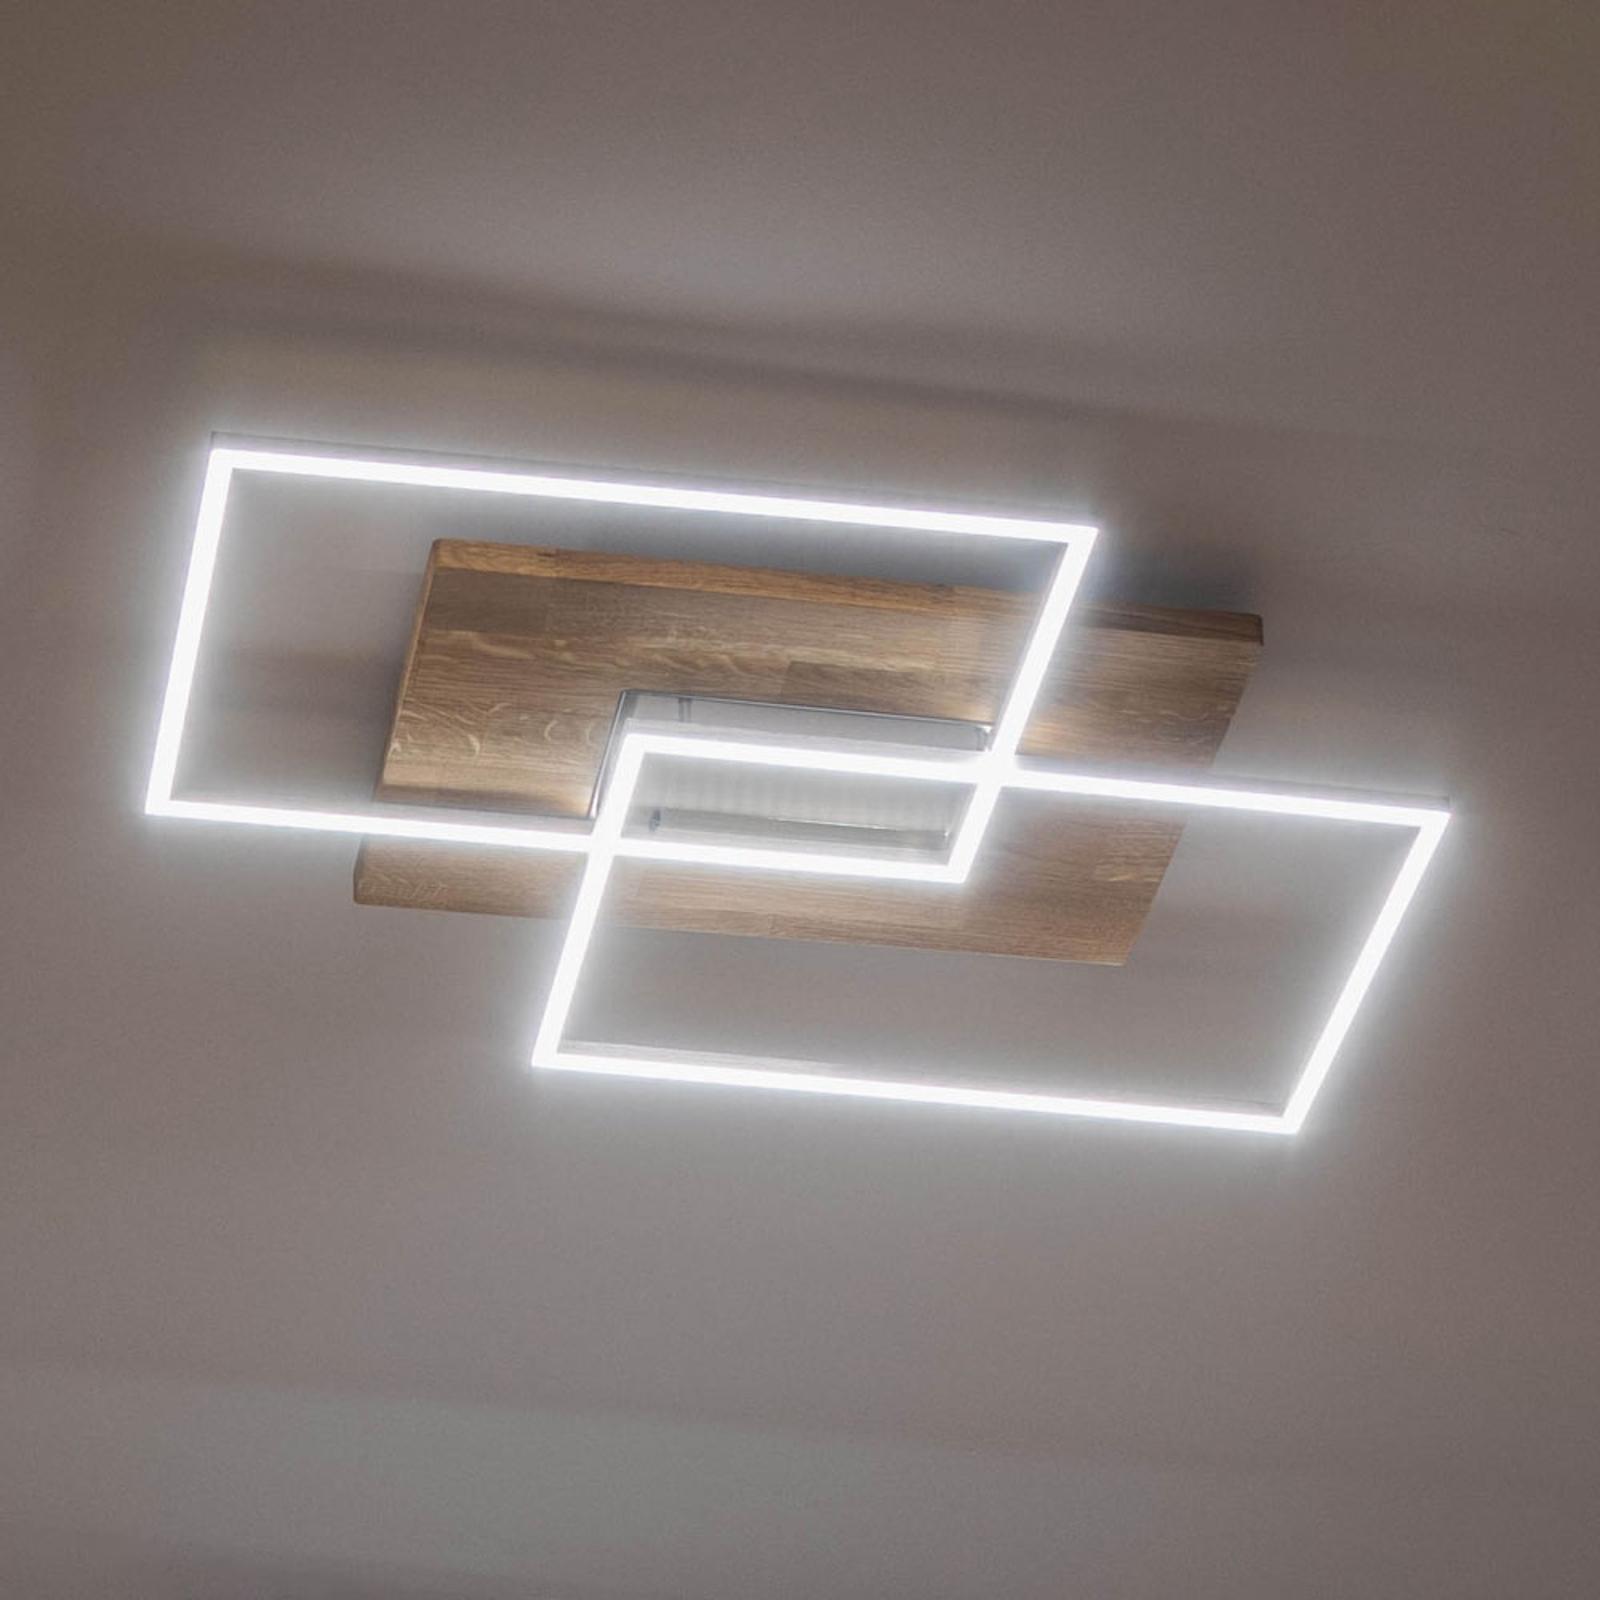 LED plafondlamp Panama L, eiken natuur